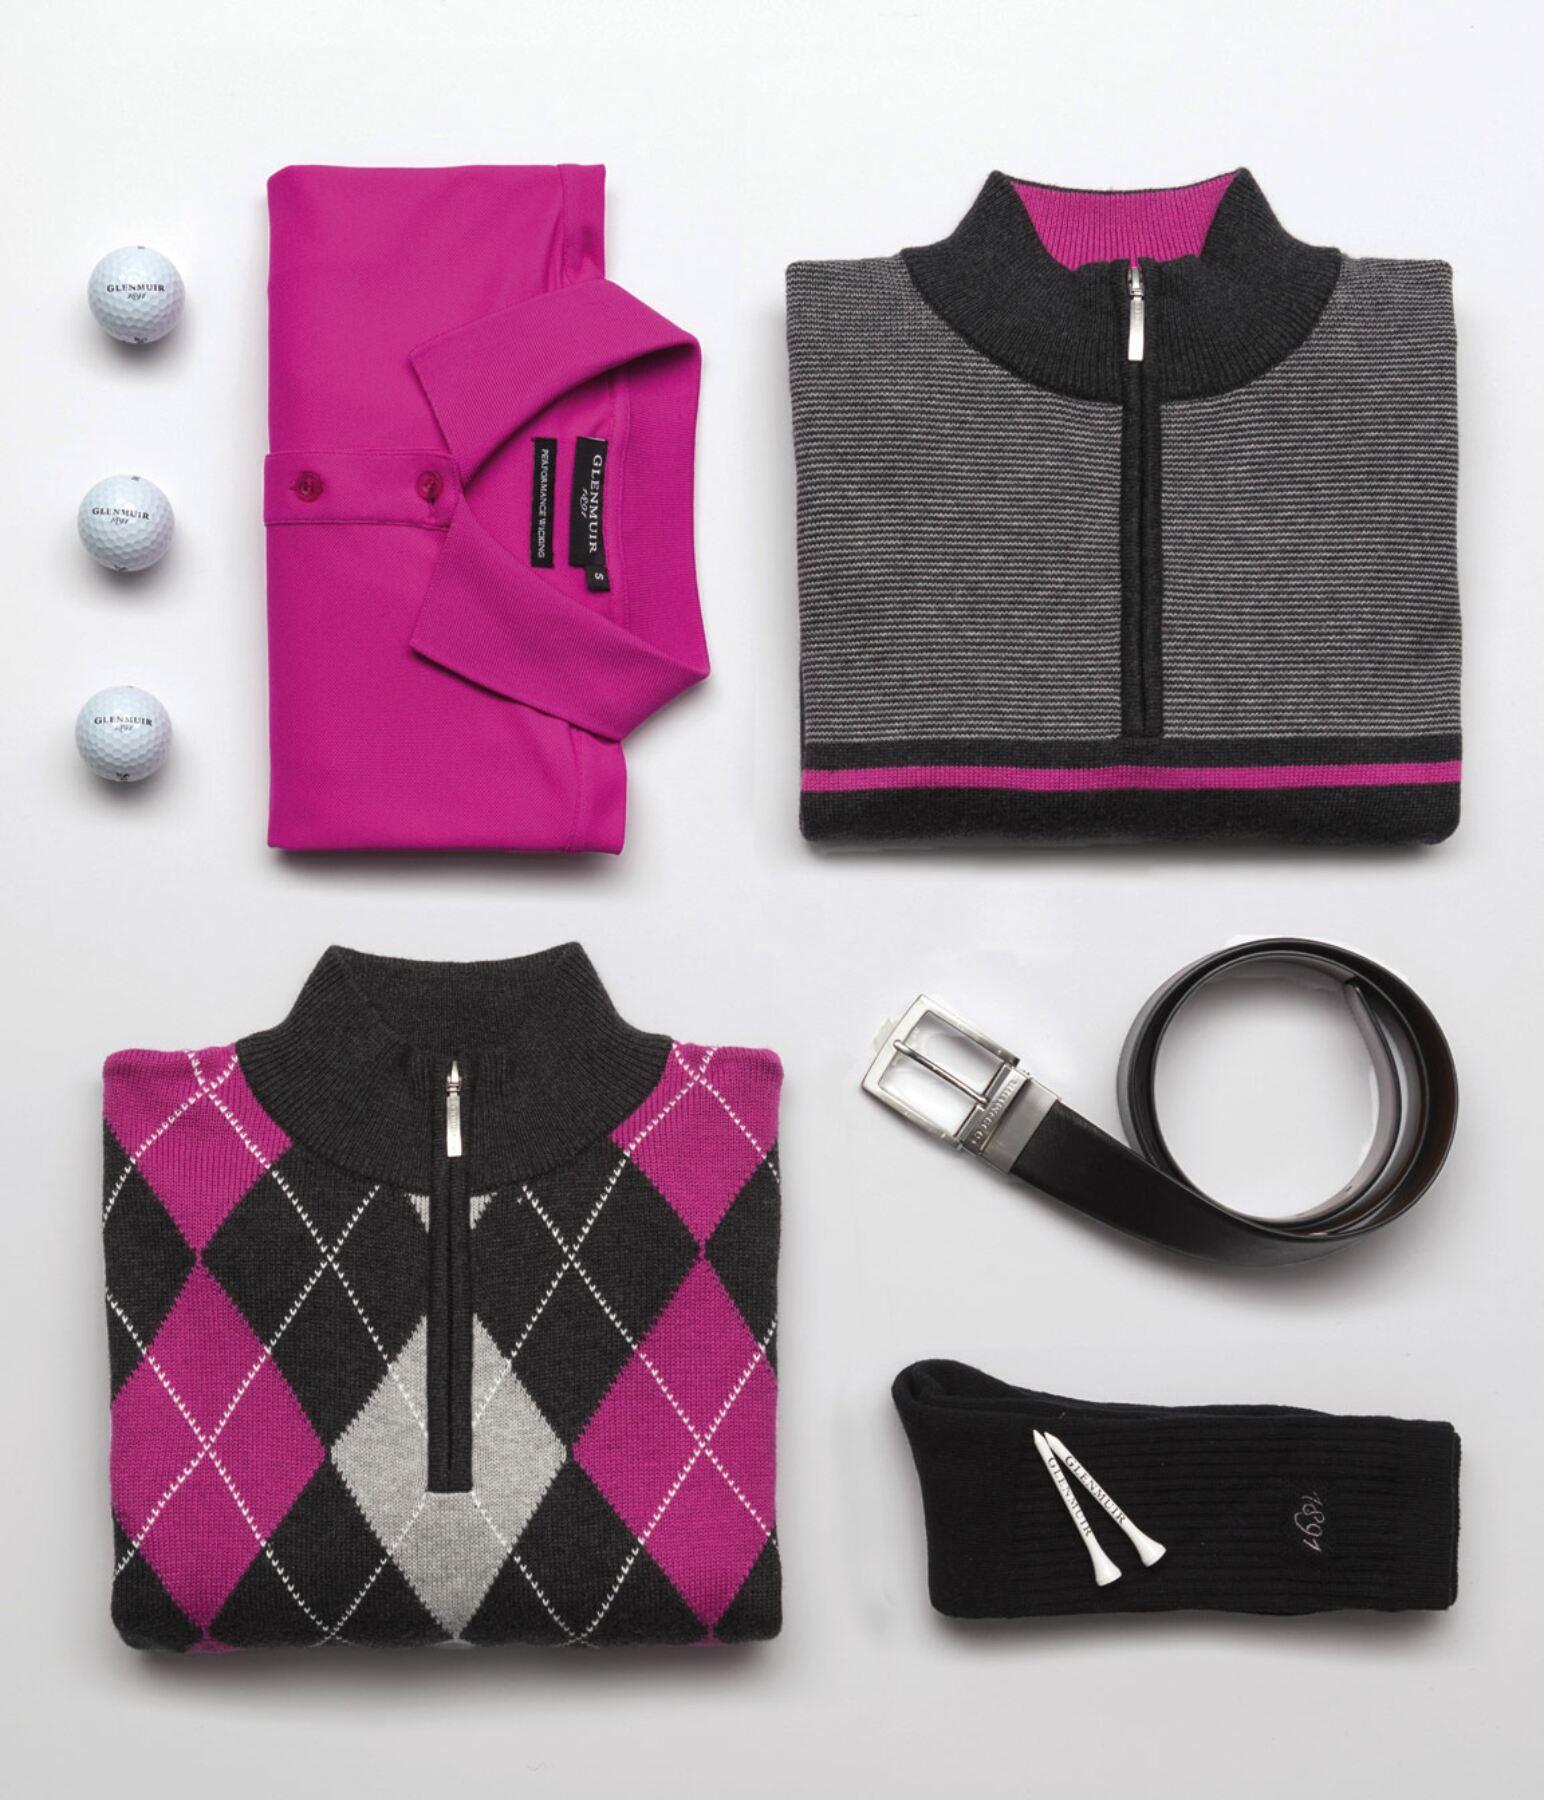 Glenmuir - Crafting Scottish Quality Golf Clothing Since 1891